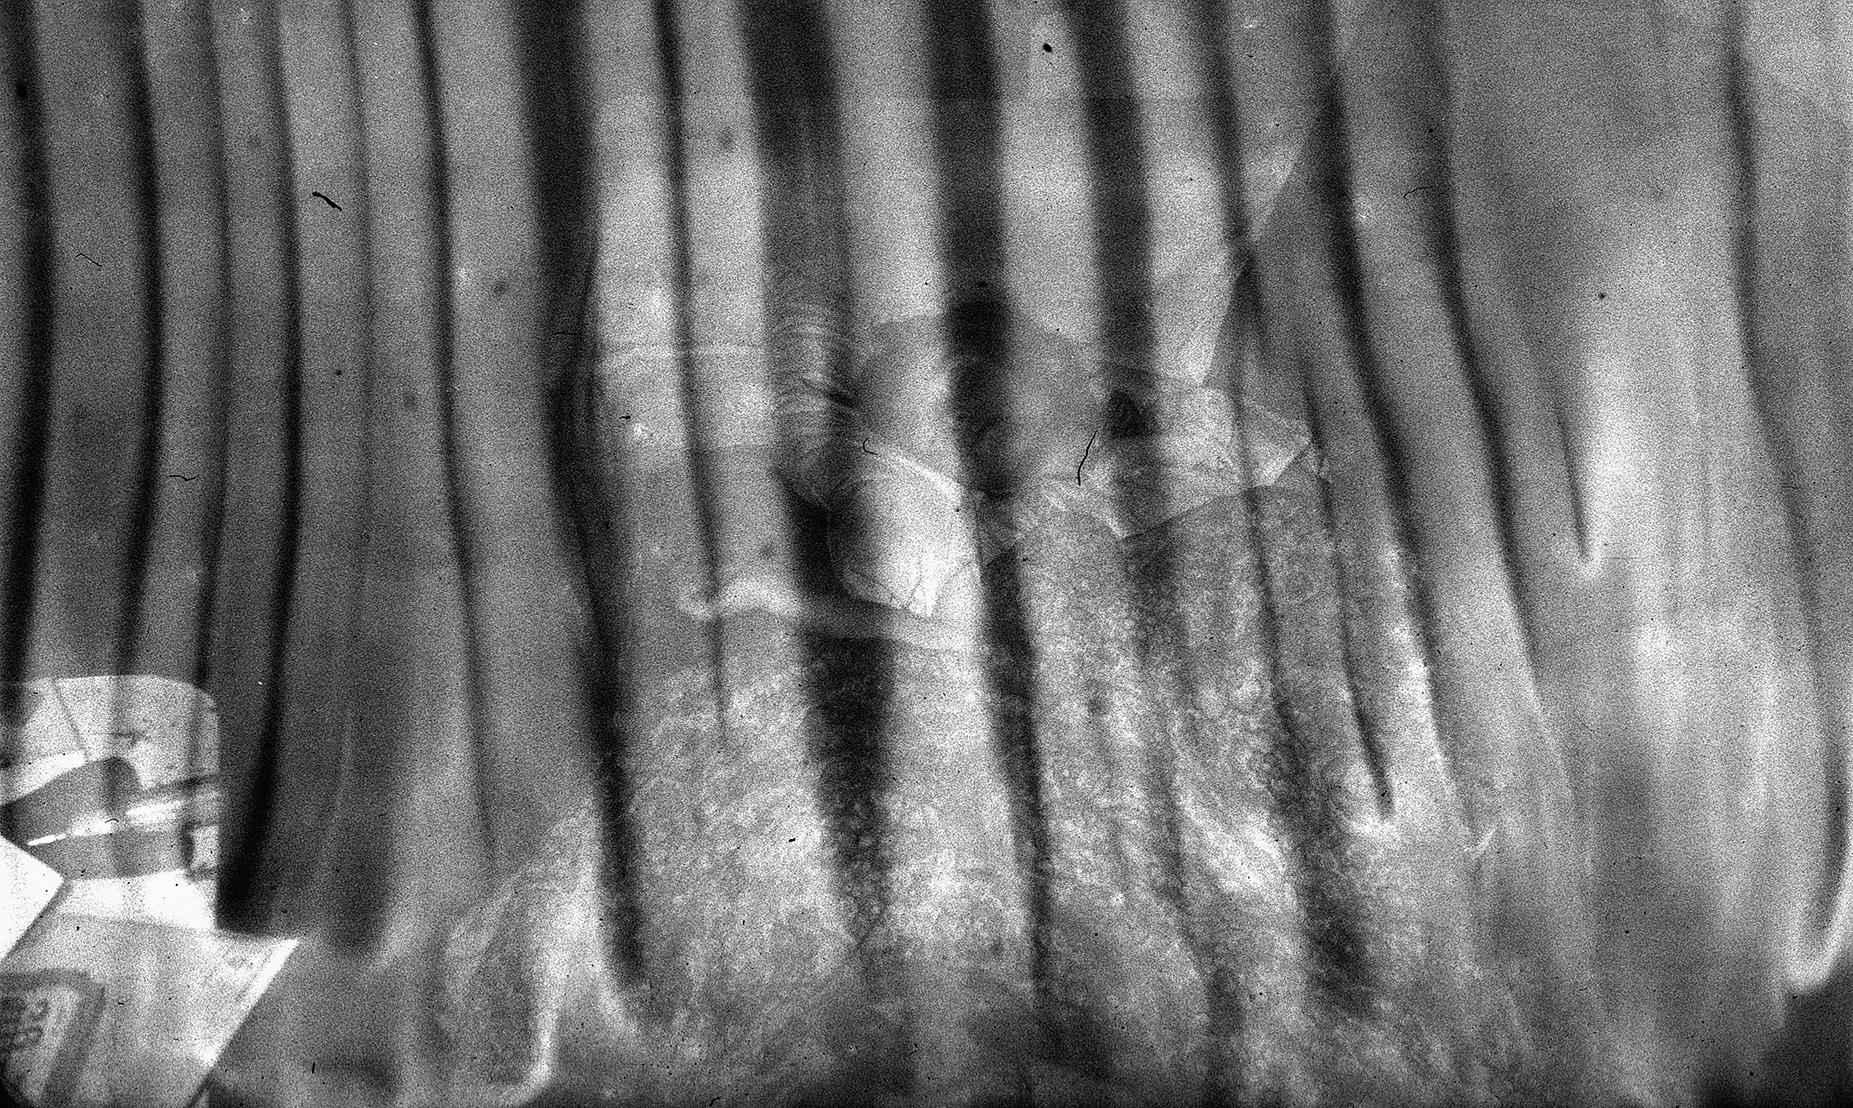 Paul Bundle 18 Roll 1 006.jpg